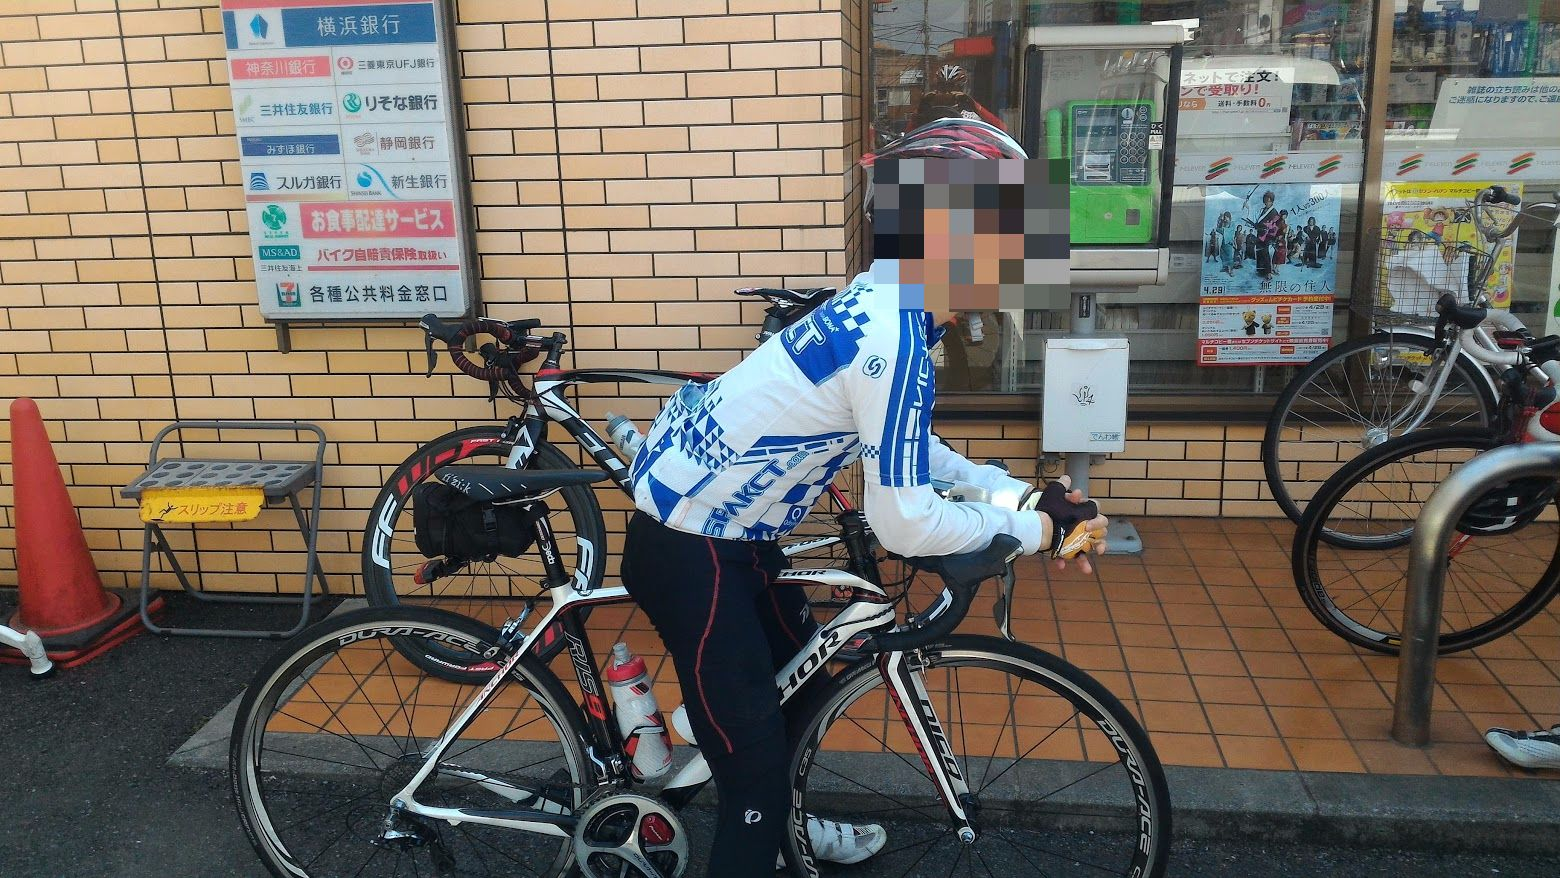 P_20170415_100612.jpg